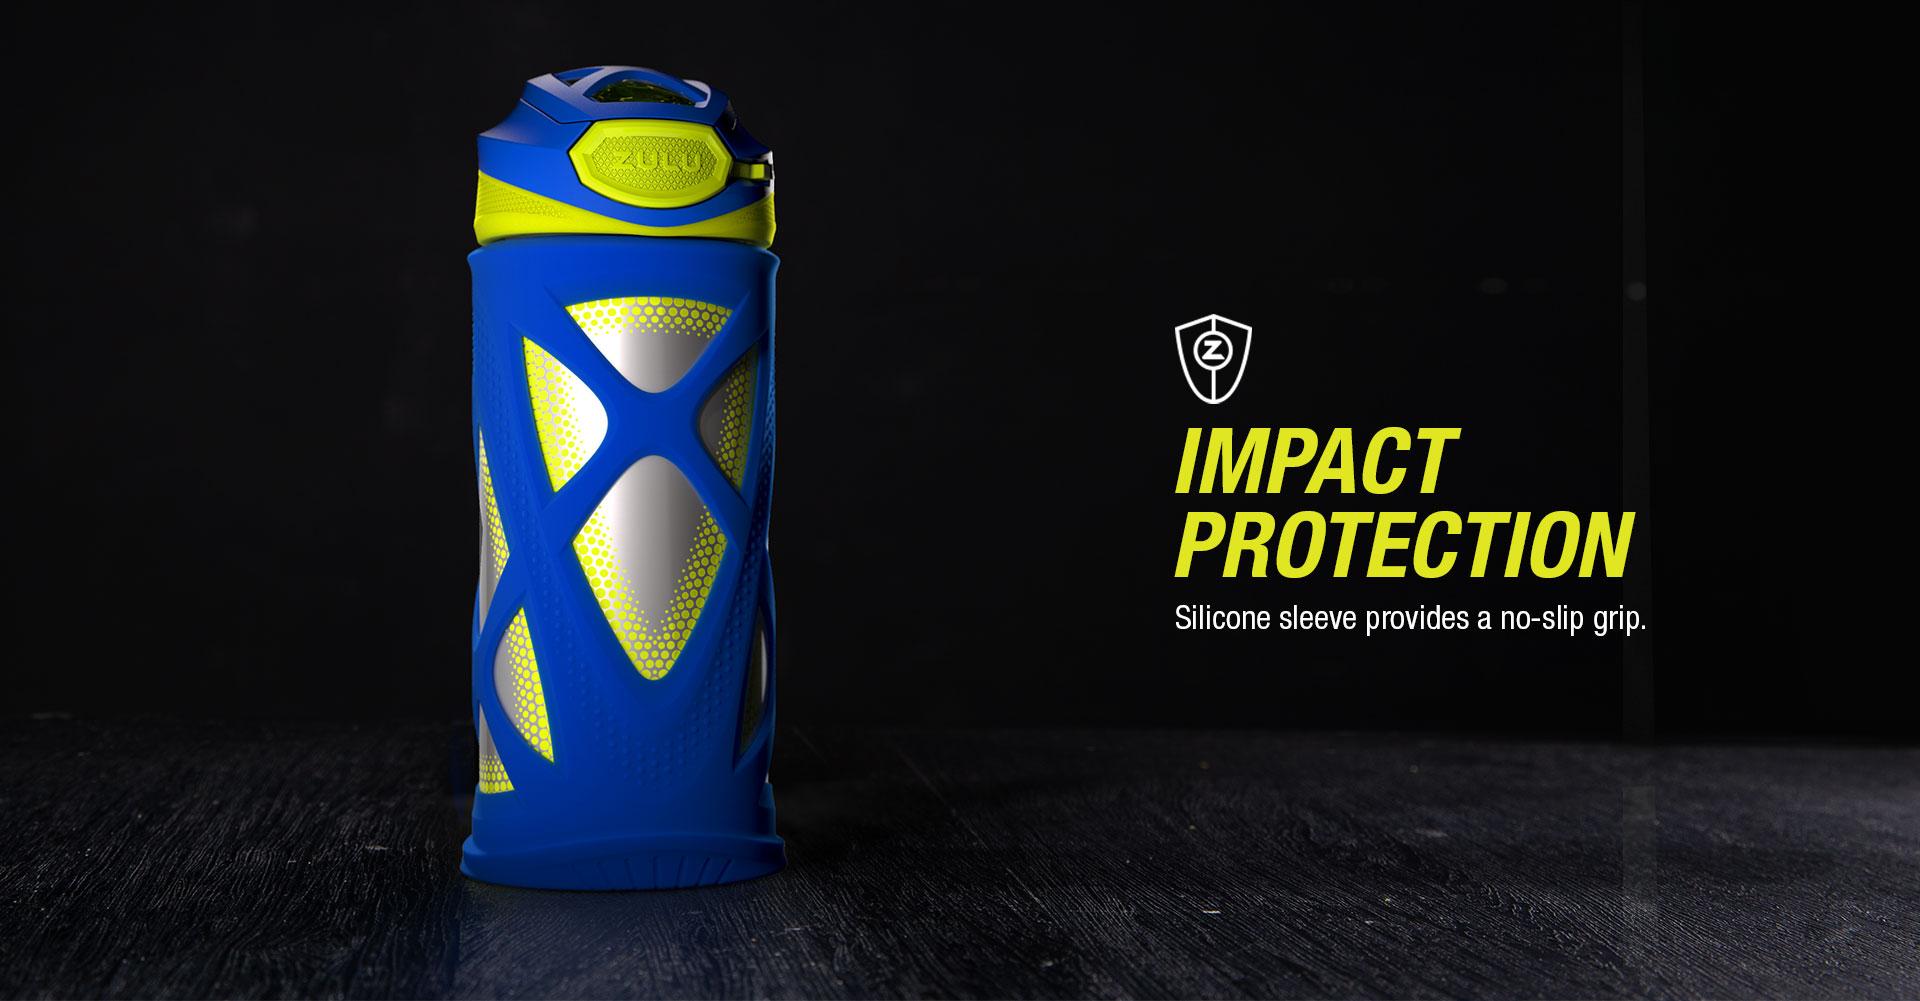 2019.02.18_Zulu_Echo-Kids-Water-Bottle_Banner01_Website_Impact-Protection.jpg